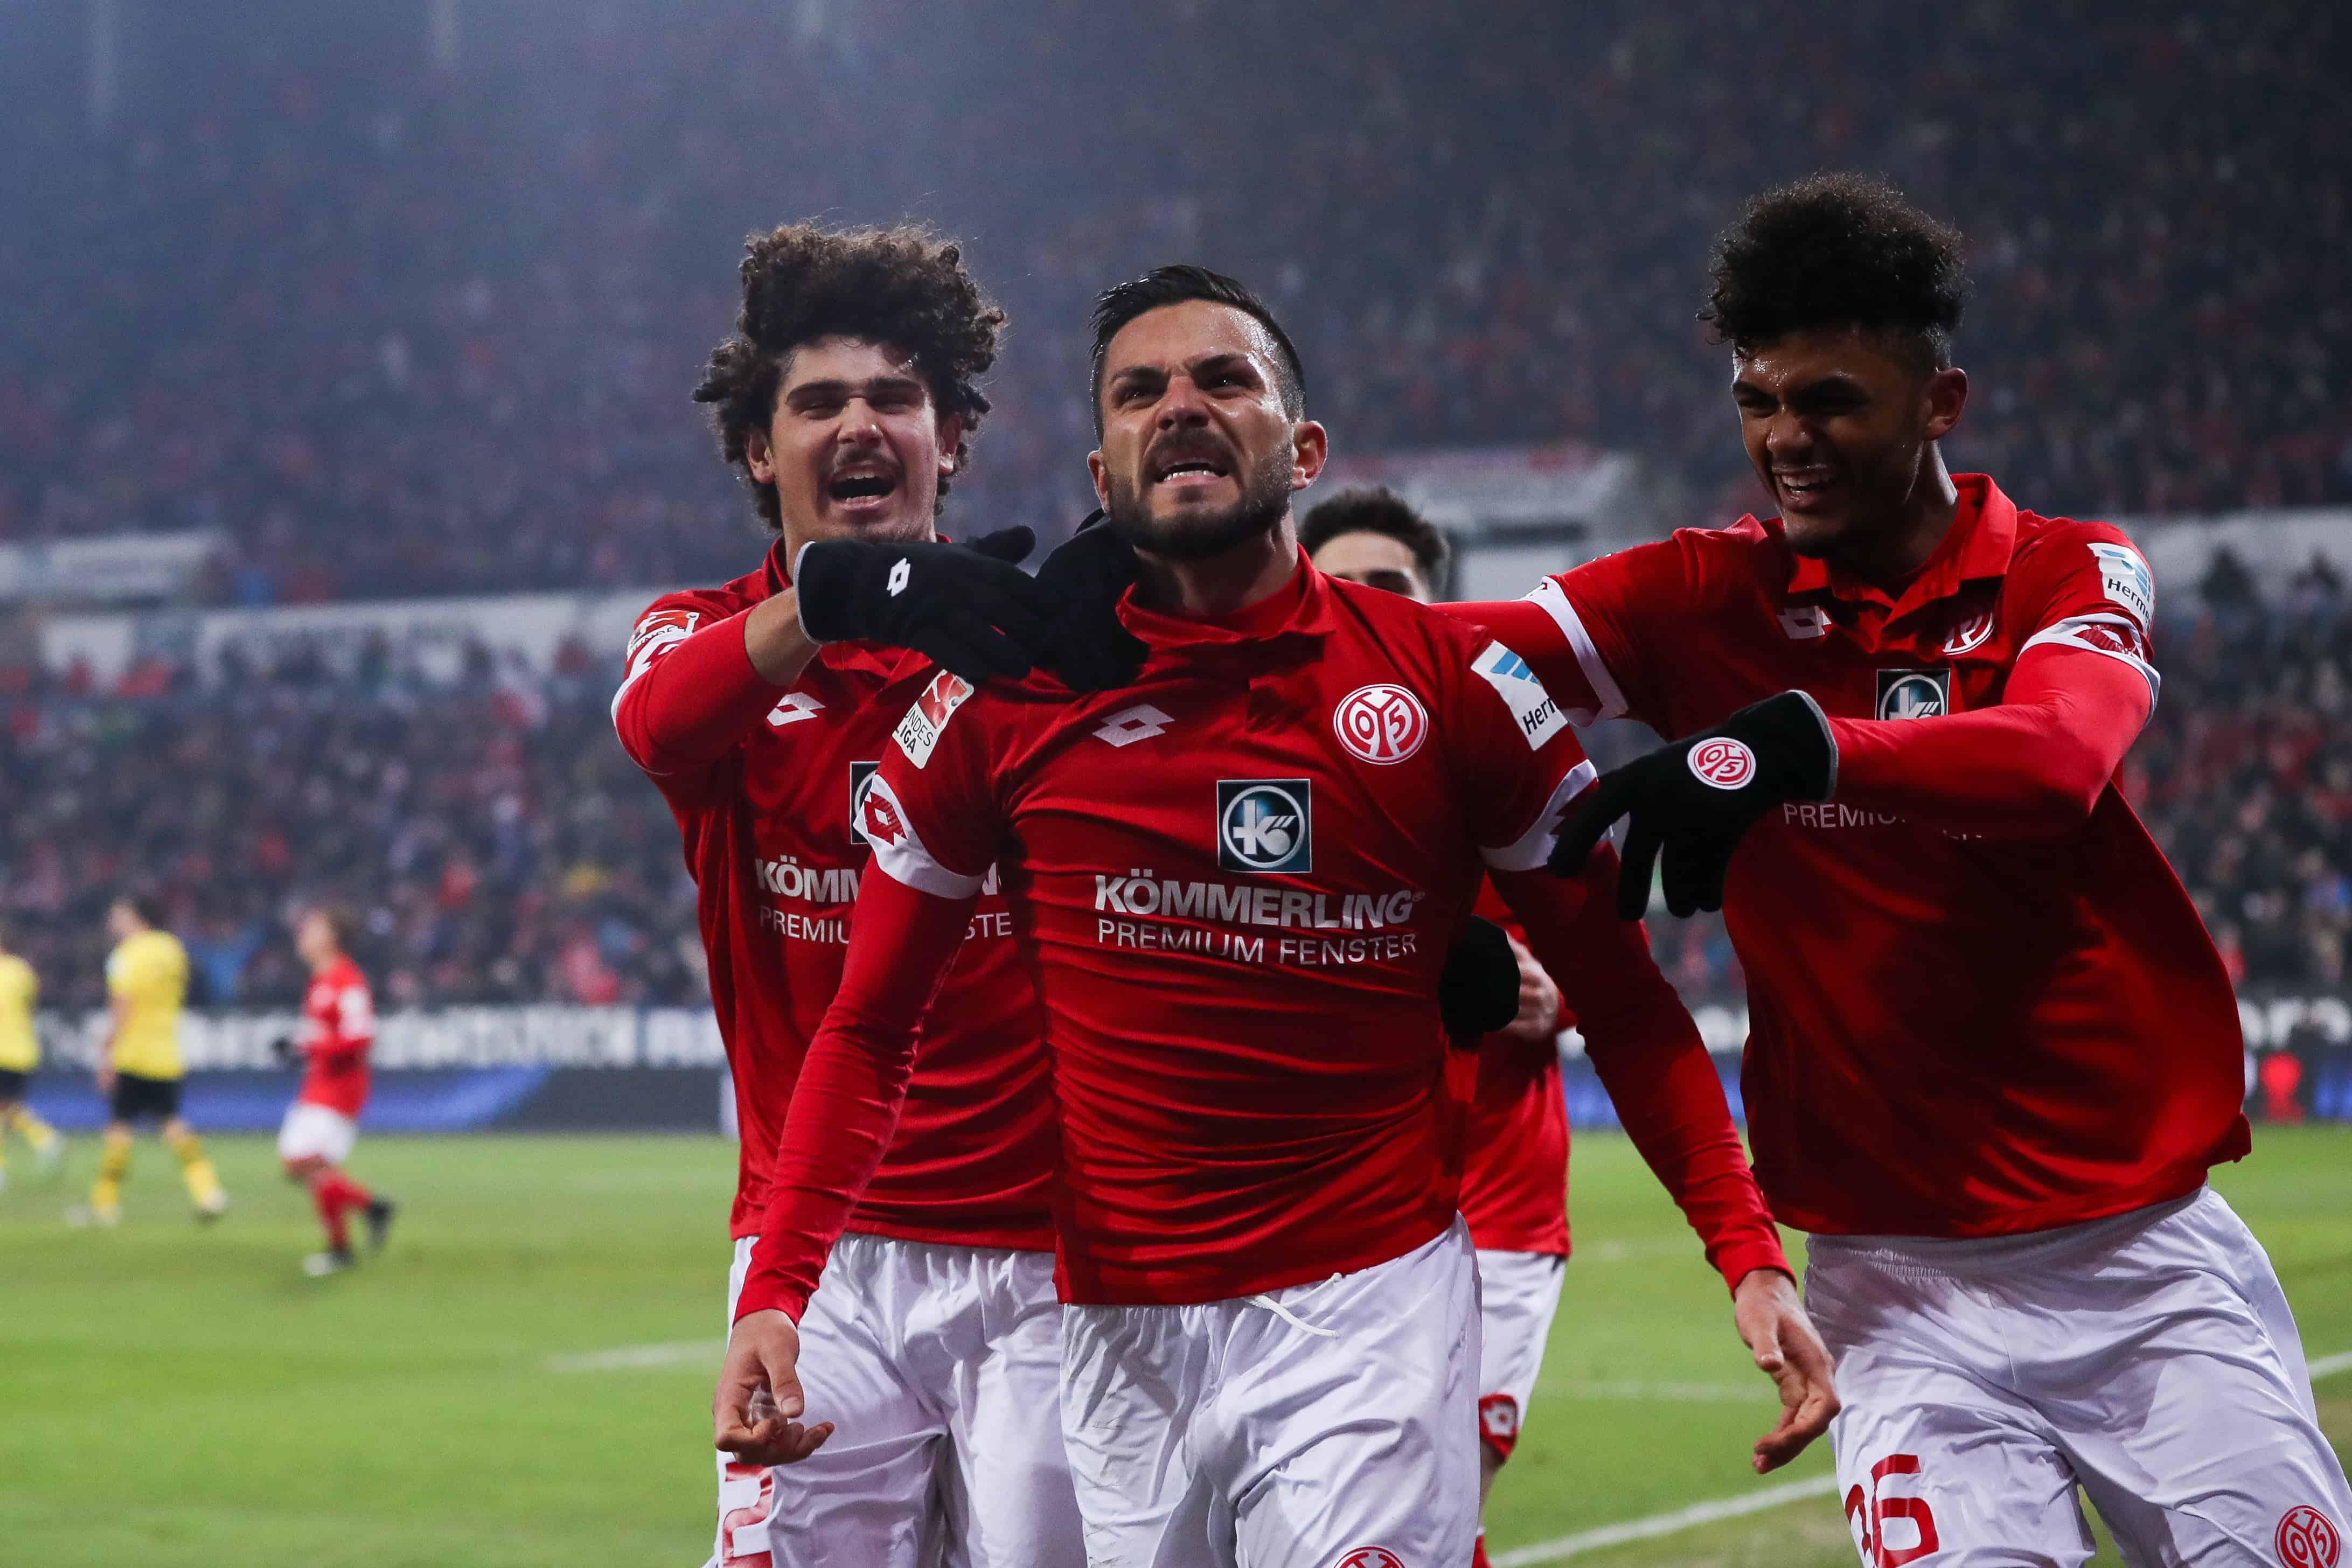 Prediksi Mainz 05 vs Fortuna Dusseldorf